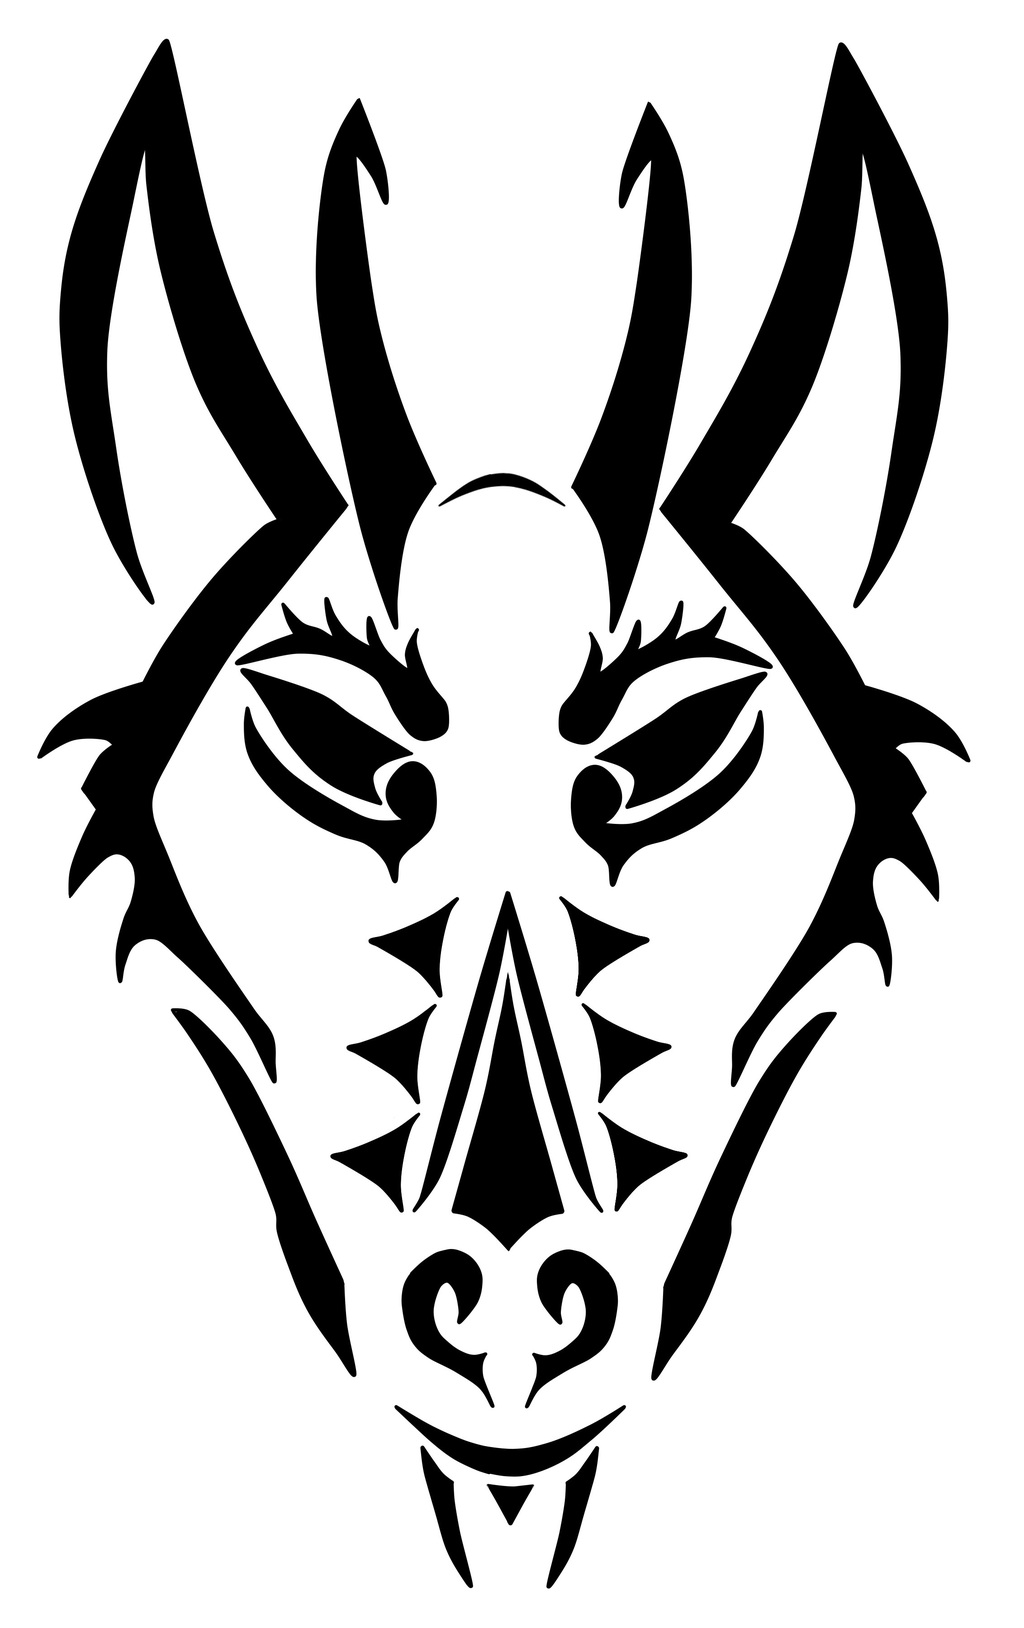 Most recent image: Bakari tribal mark